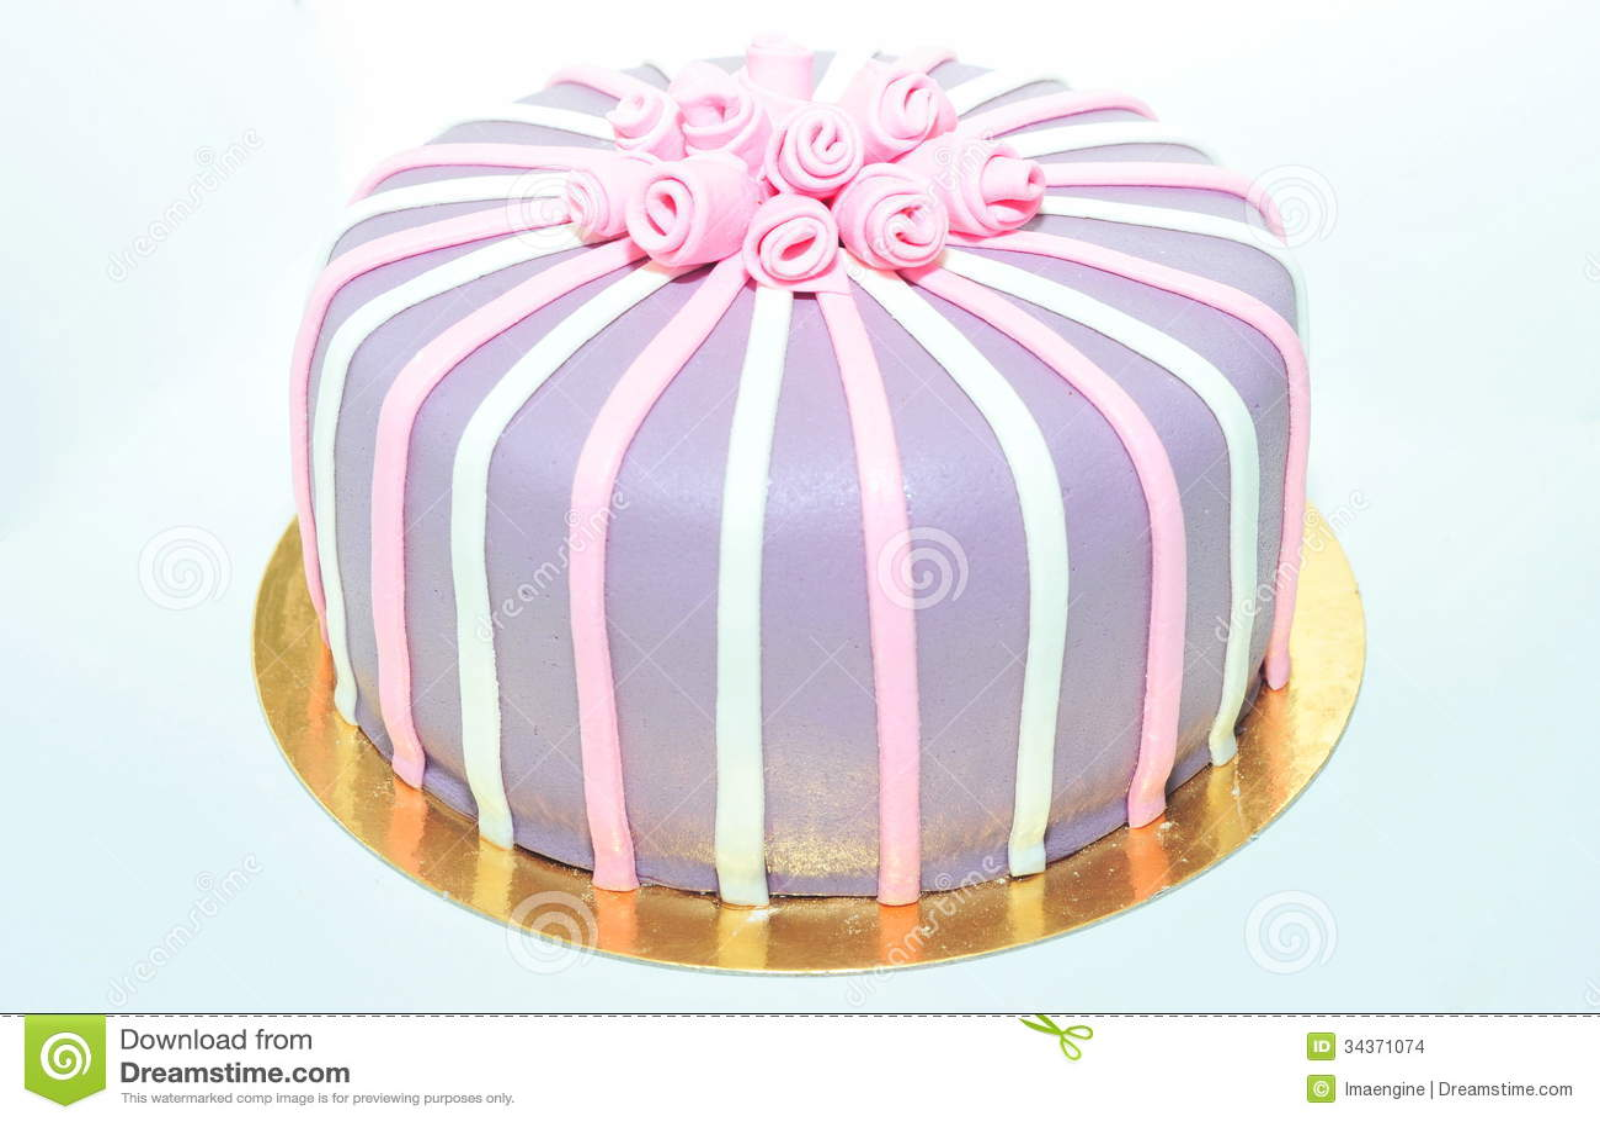 Fondant cake with roses on white